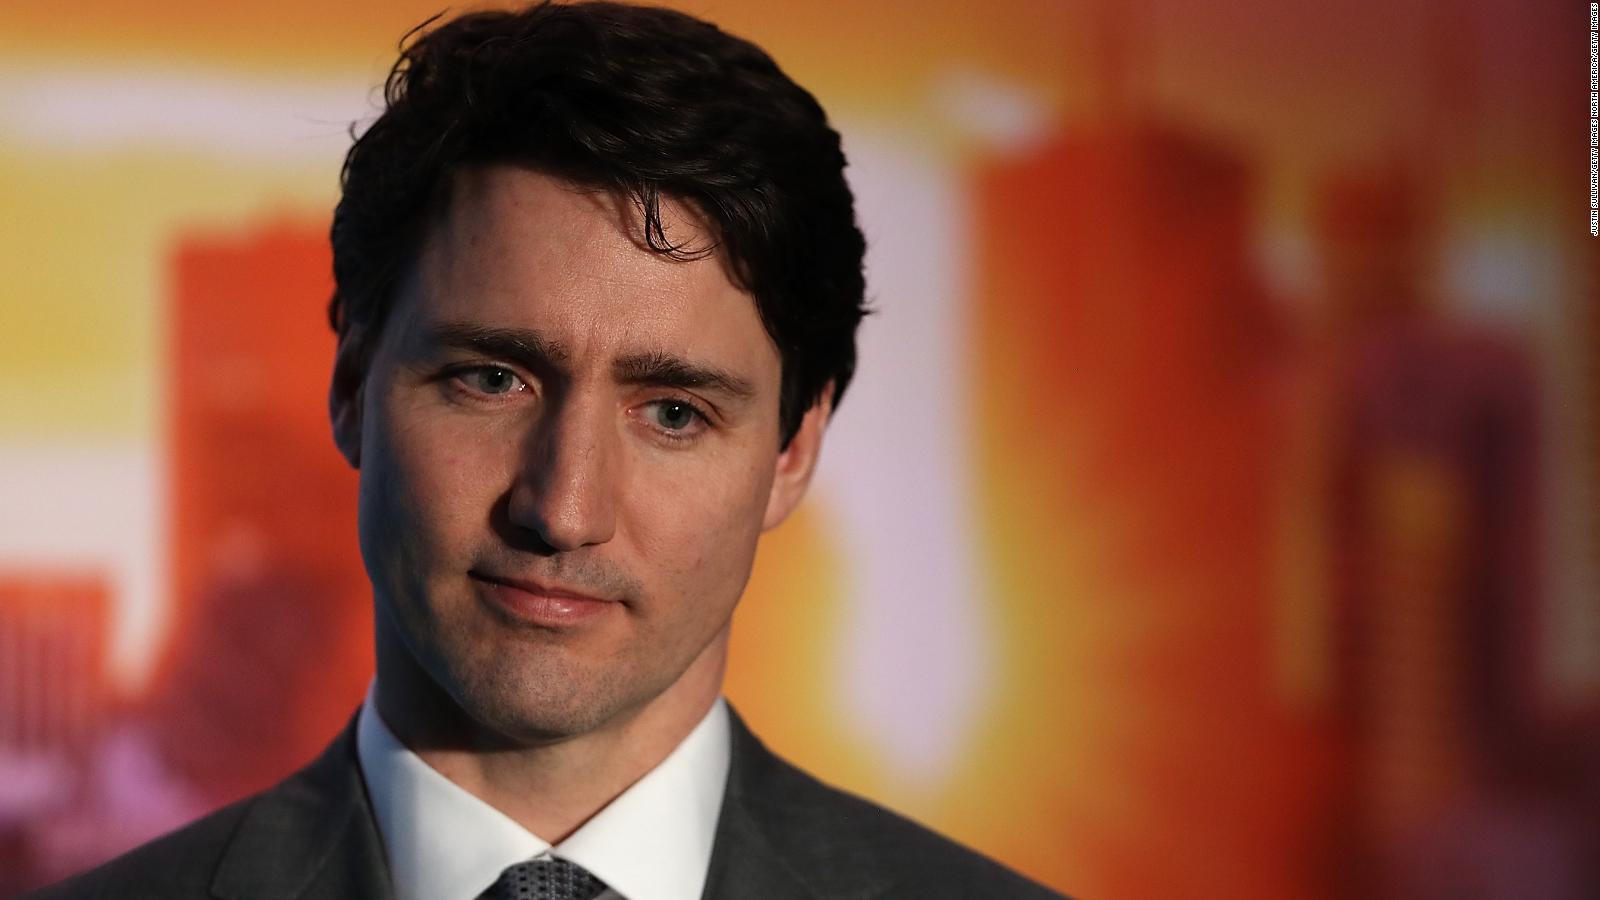 Trudeau No Sign Of US Common Sense Prevailing